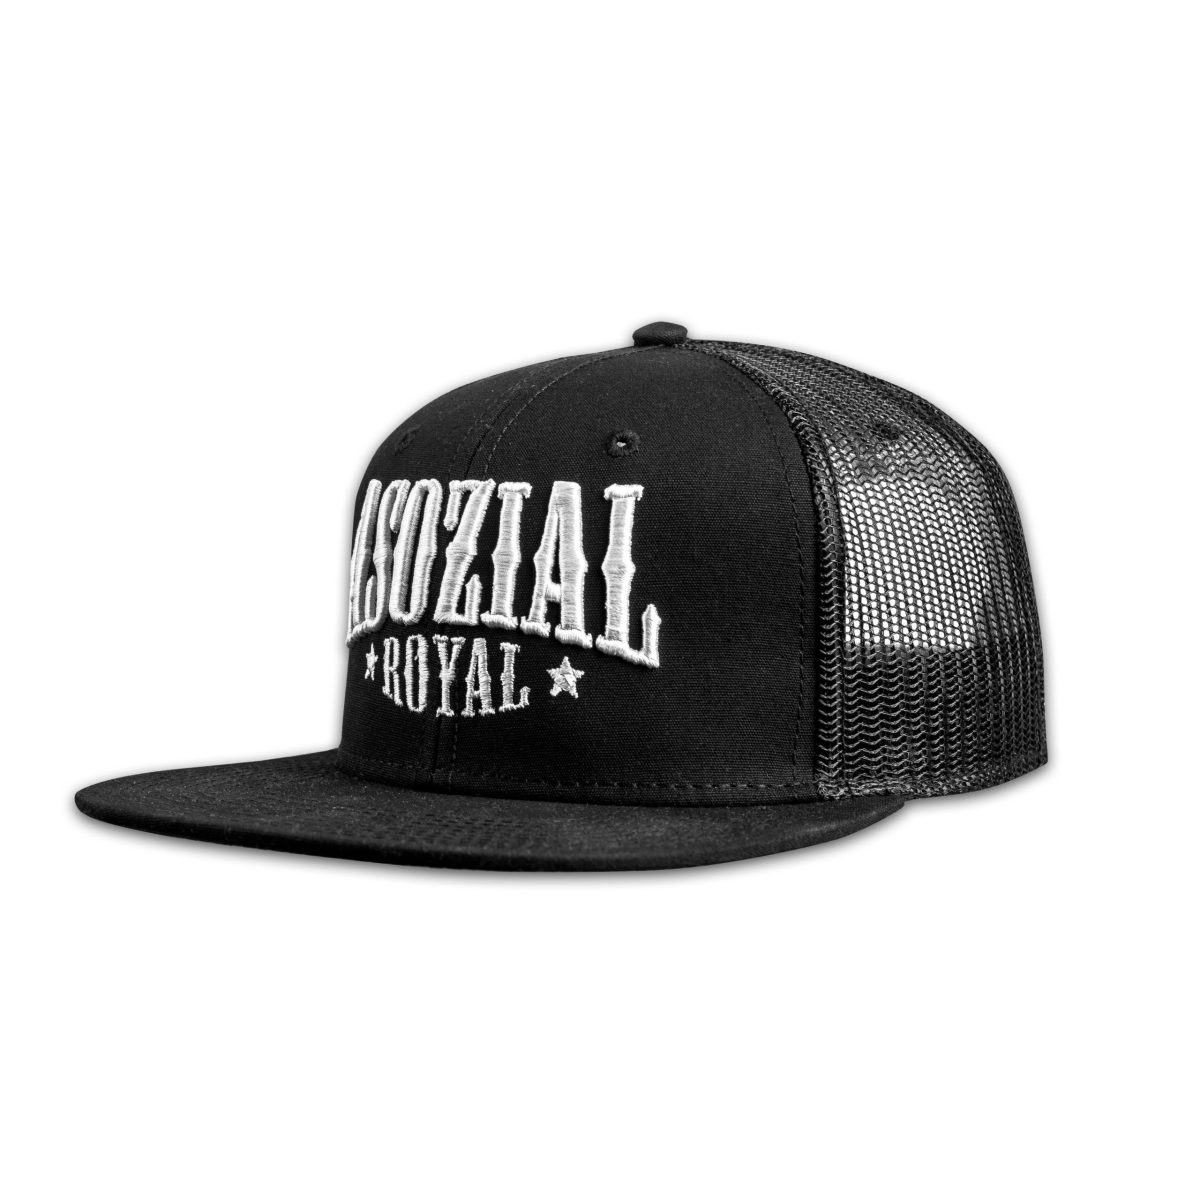 trucker-snapback-mesh-asozial-royal-asozial-royal-schwarz